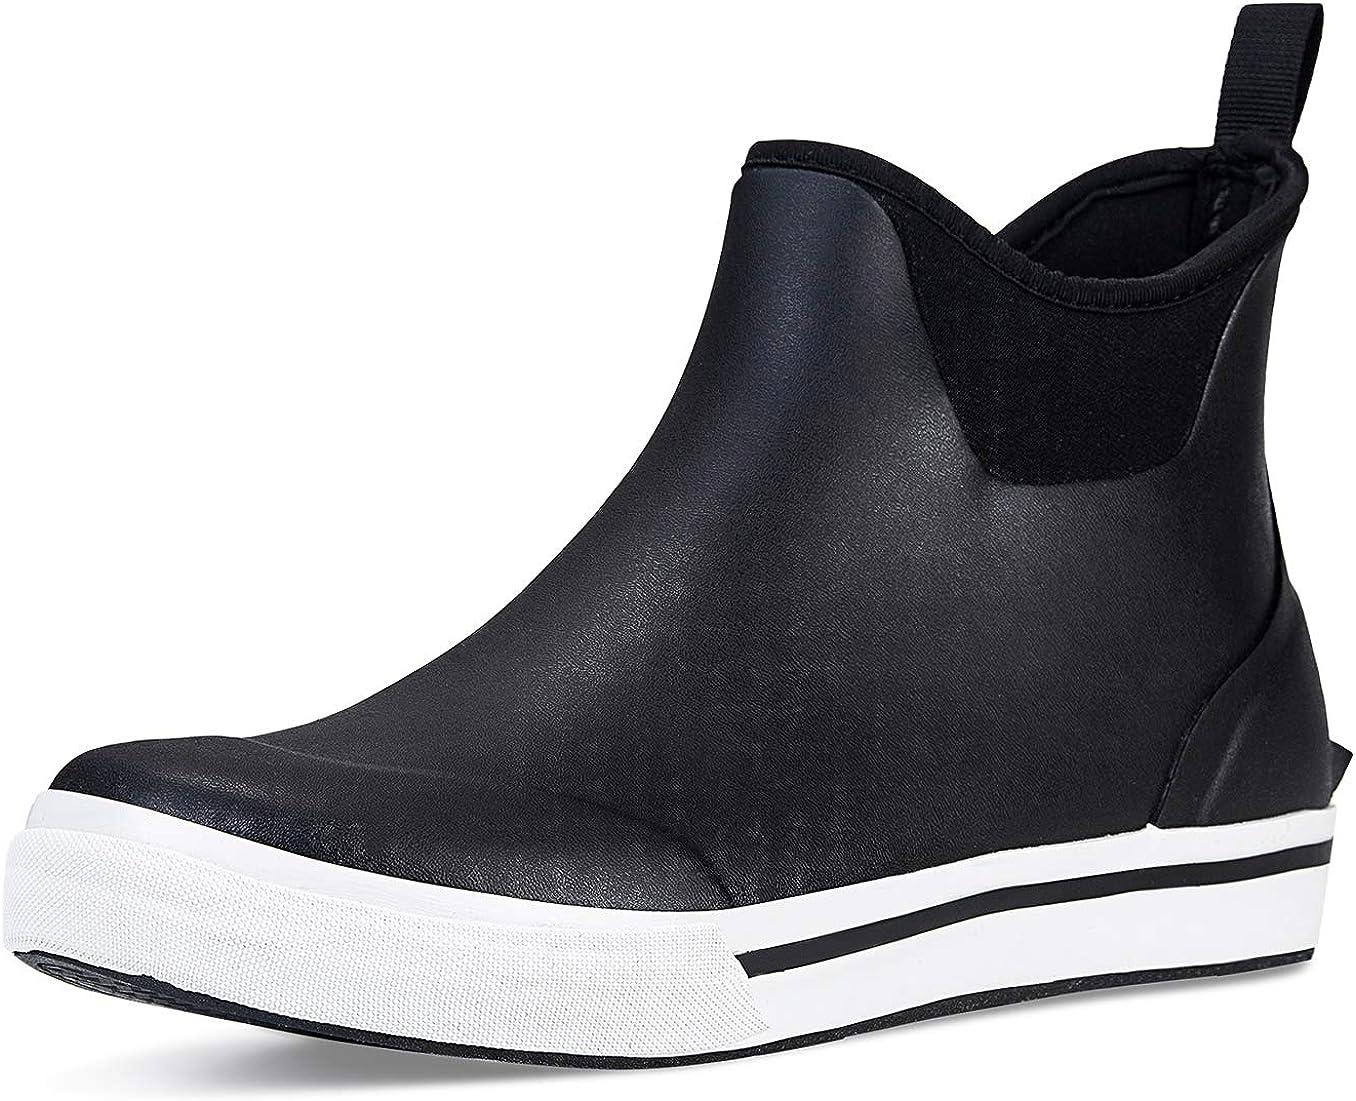 TENGTA Men's Waterproof Deck Brand new Boots Rain Footwear Credence Ankle Neoprene